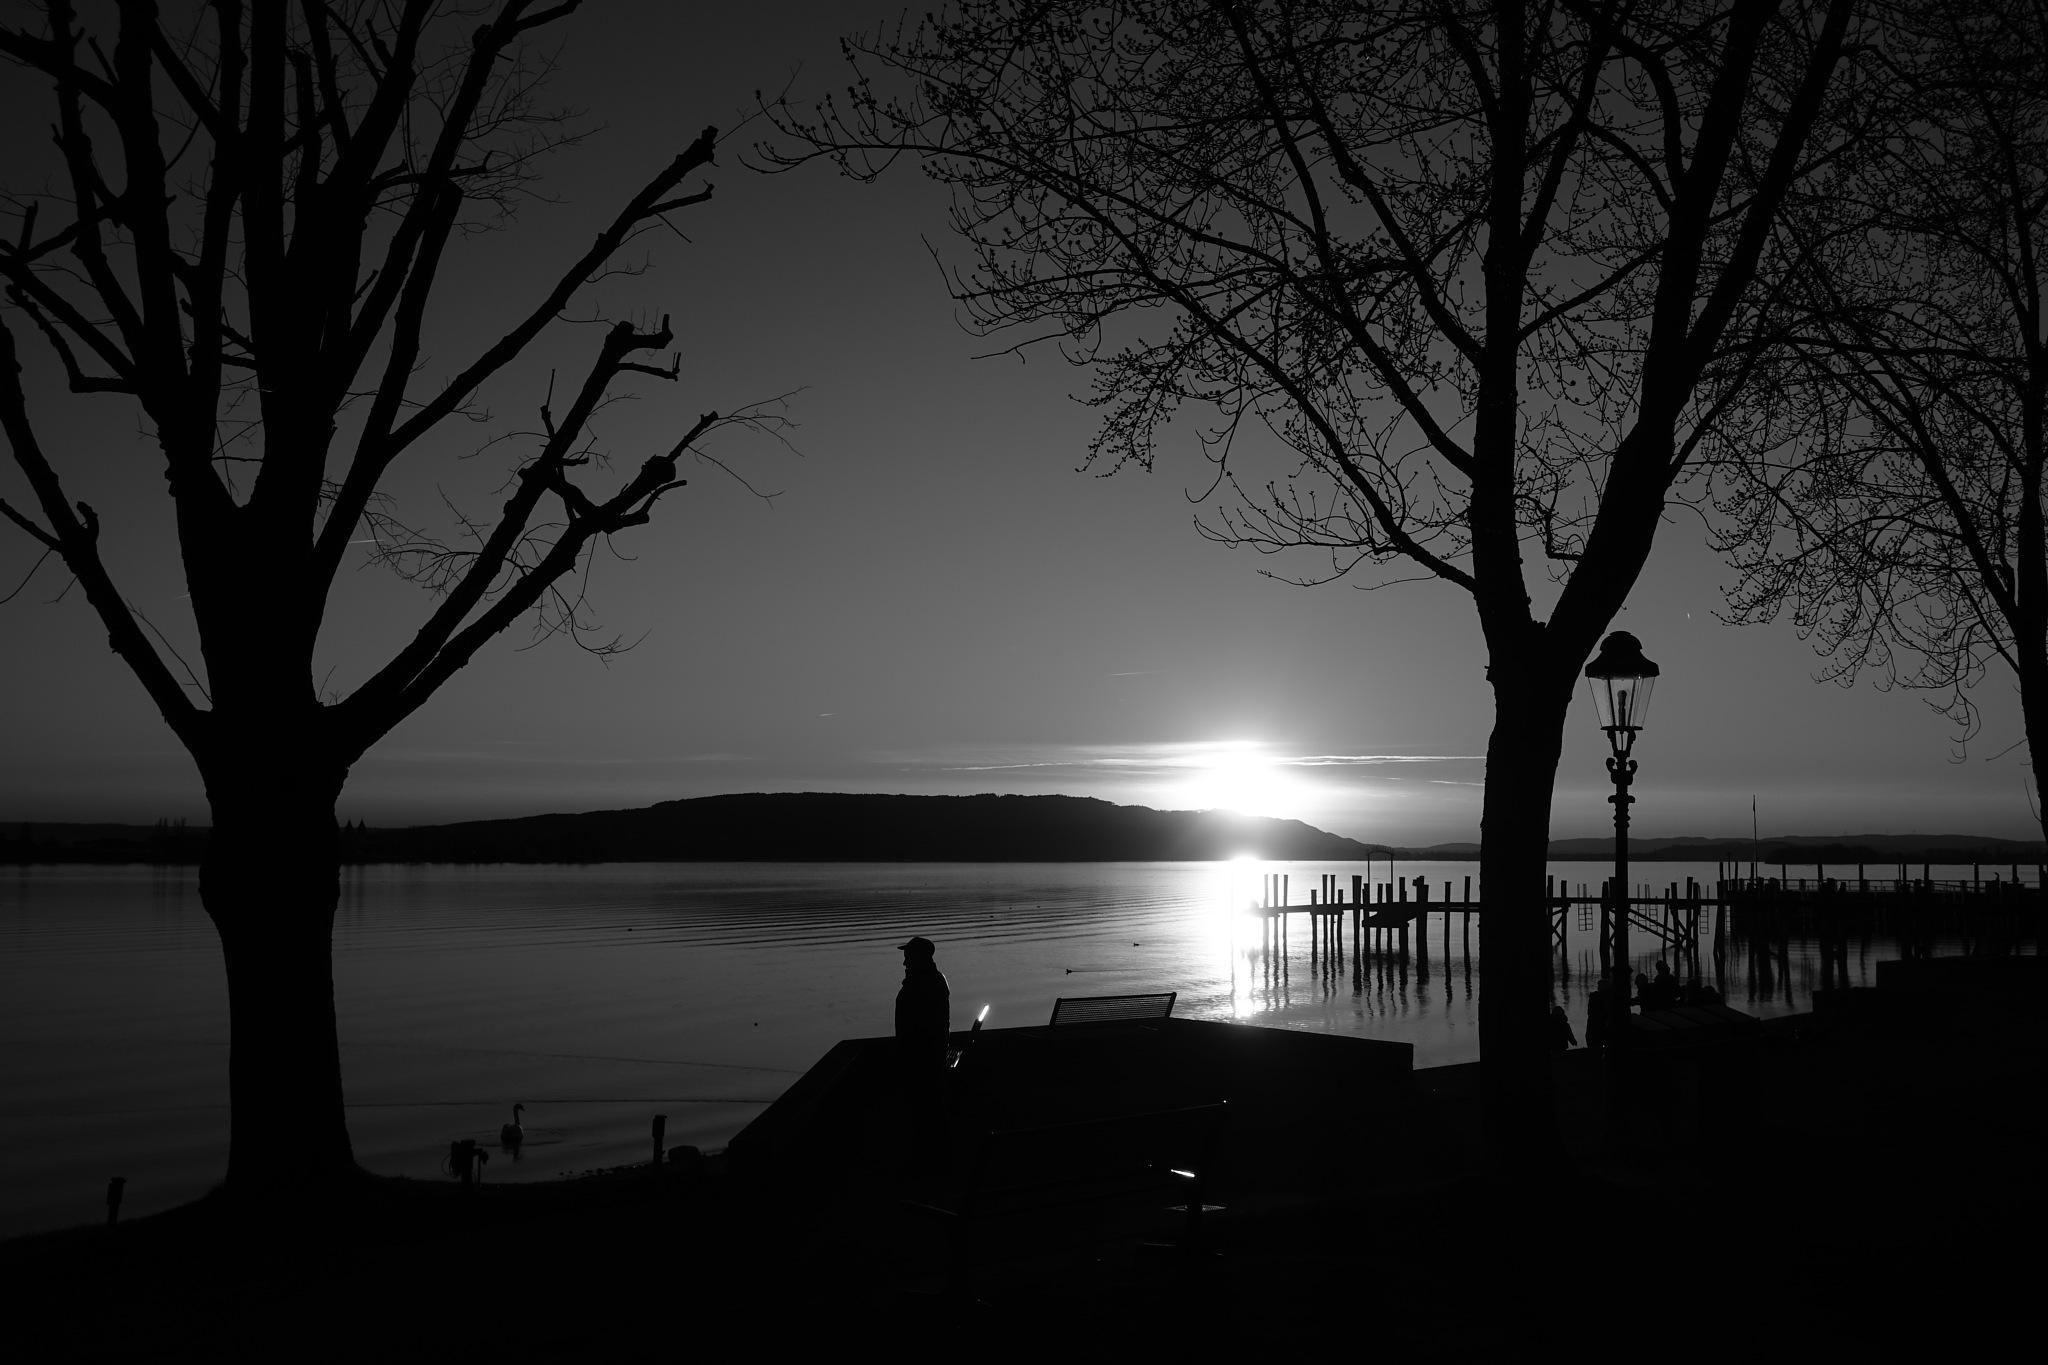 sunset (bw) by Tom Eppelin